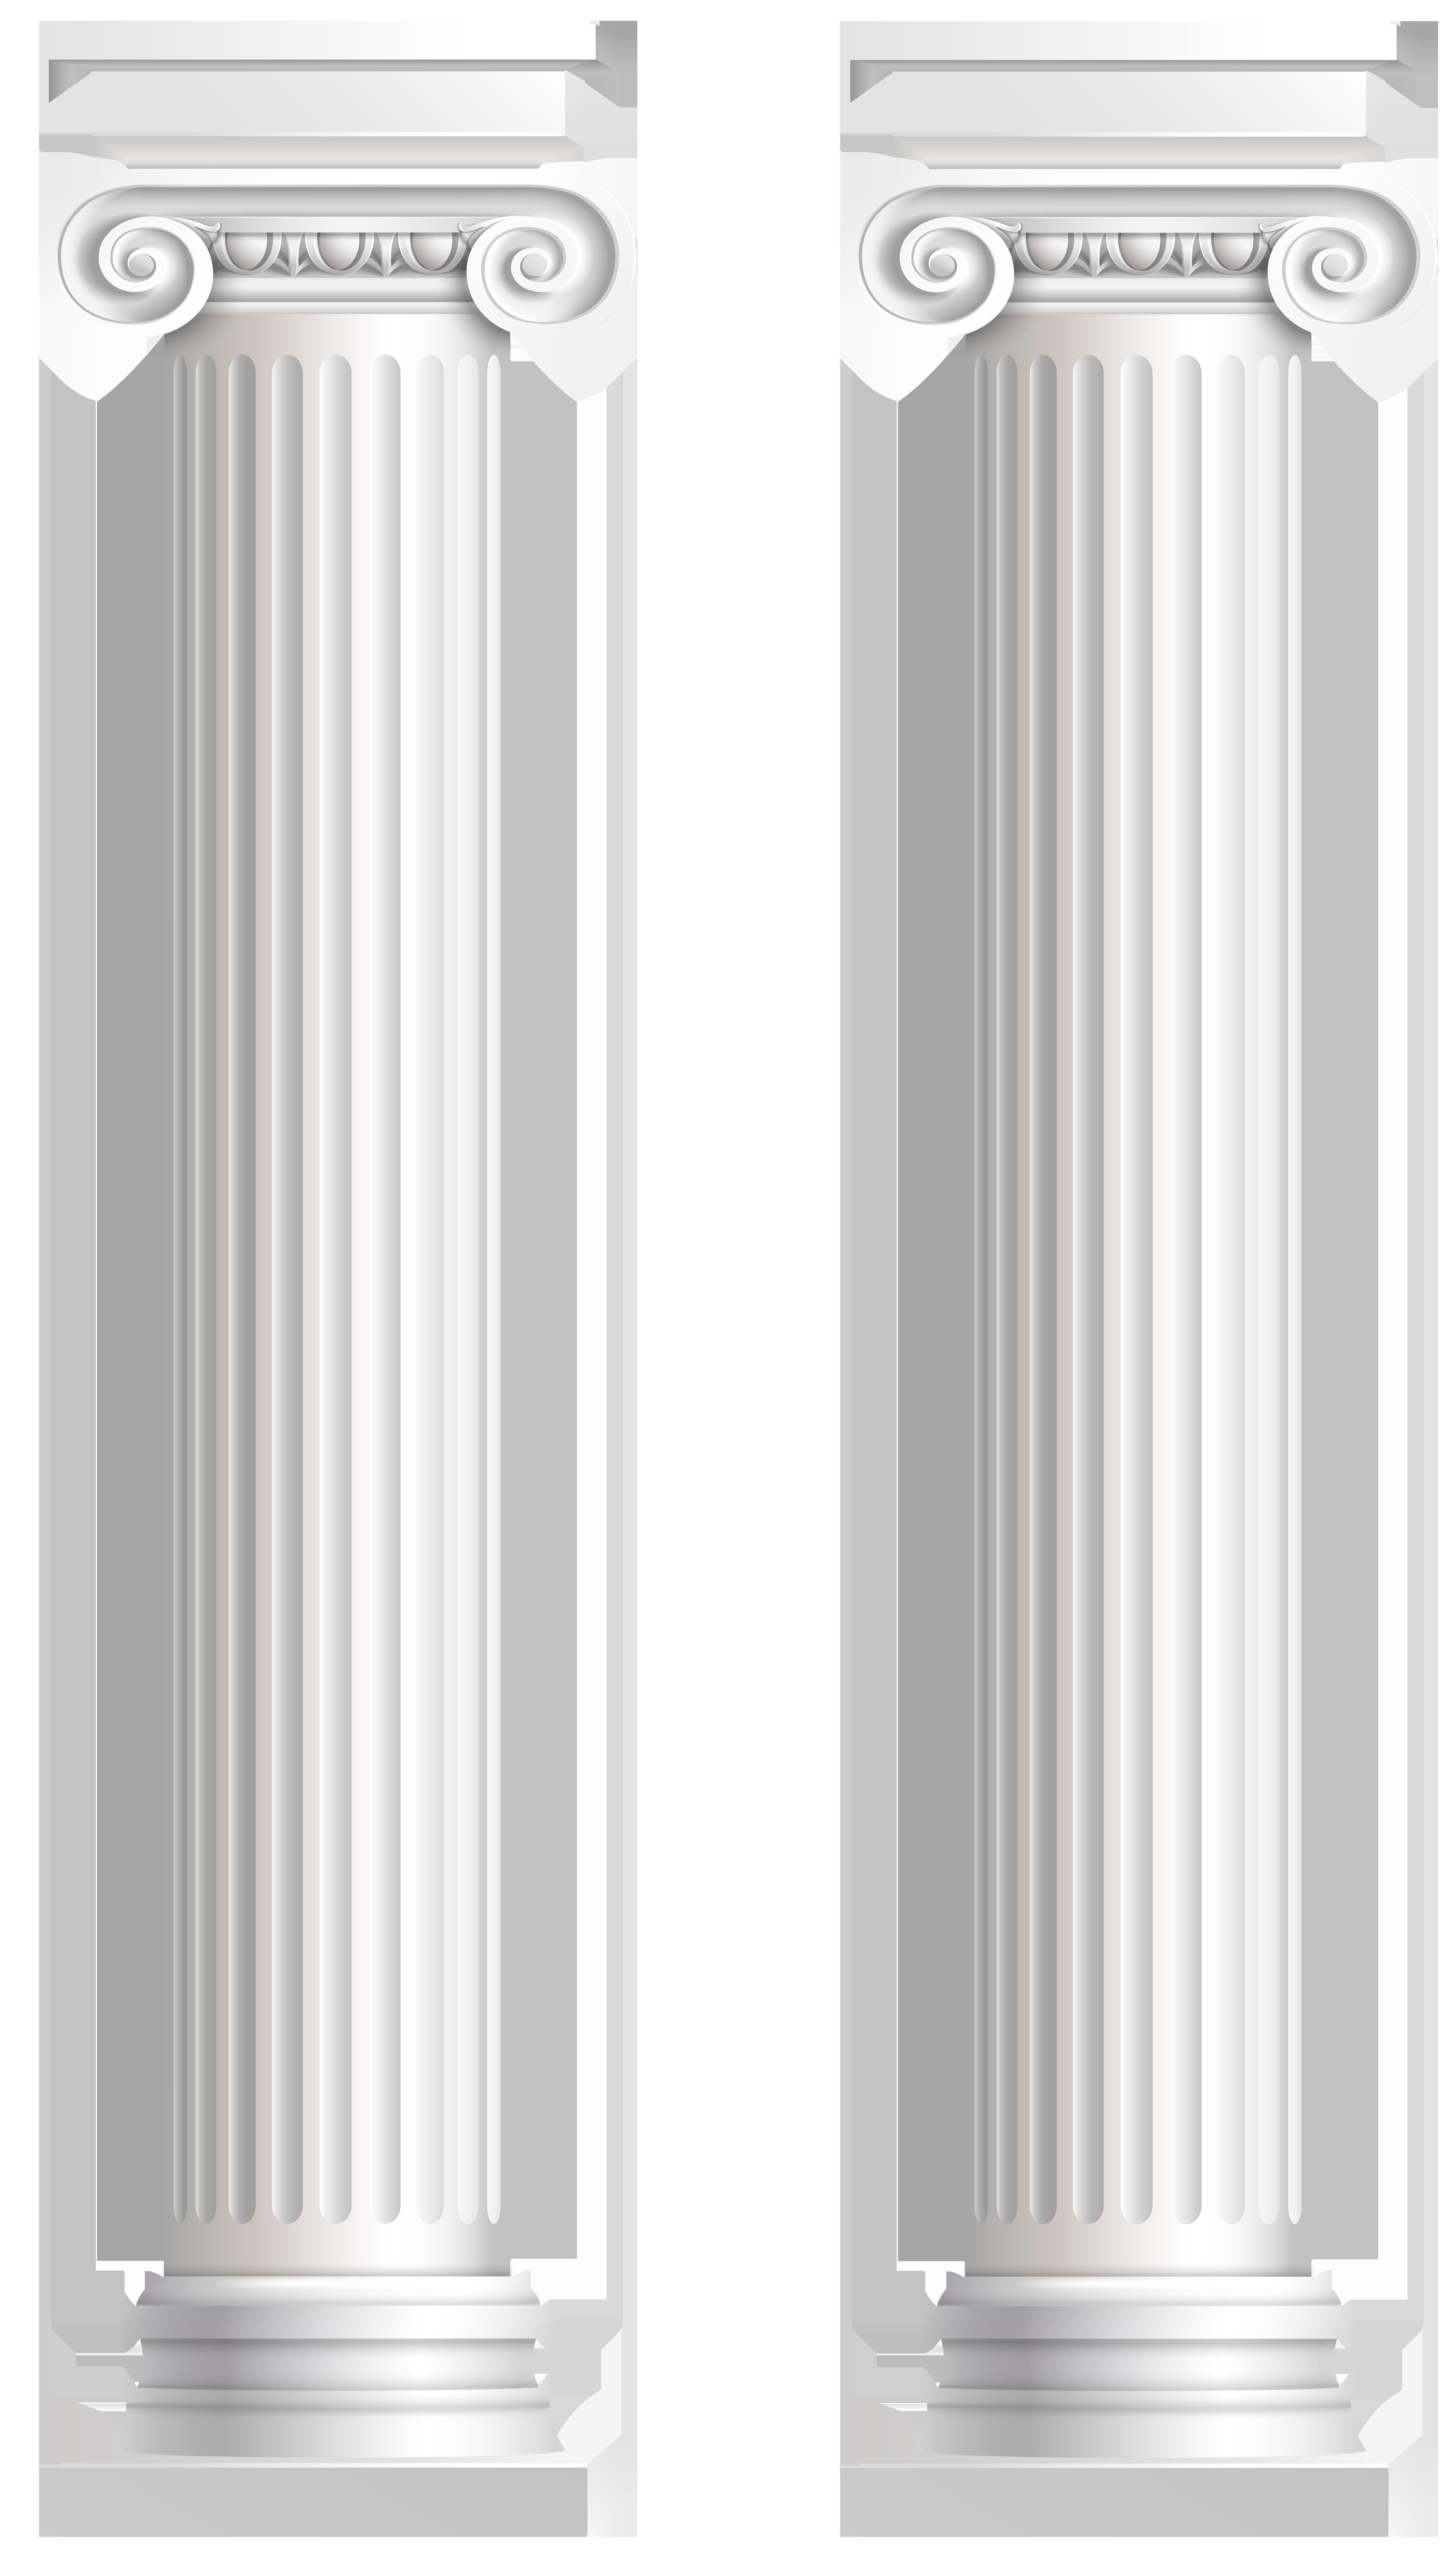 Column clipart pillar.  collection of png